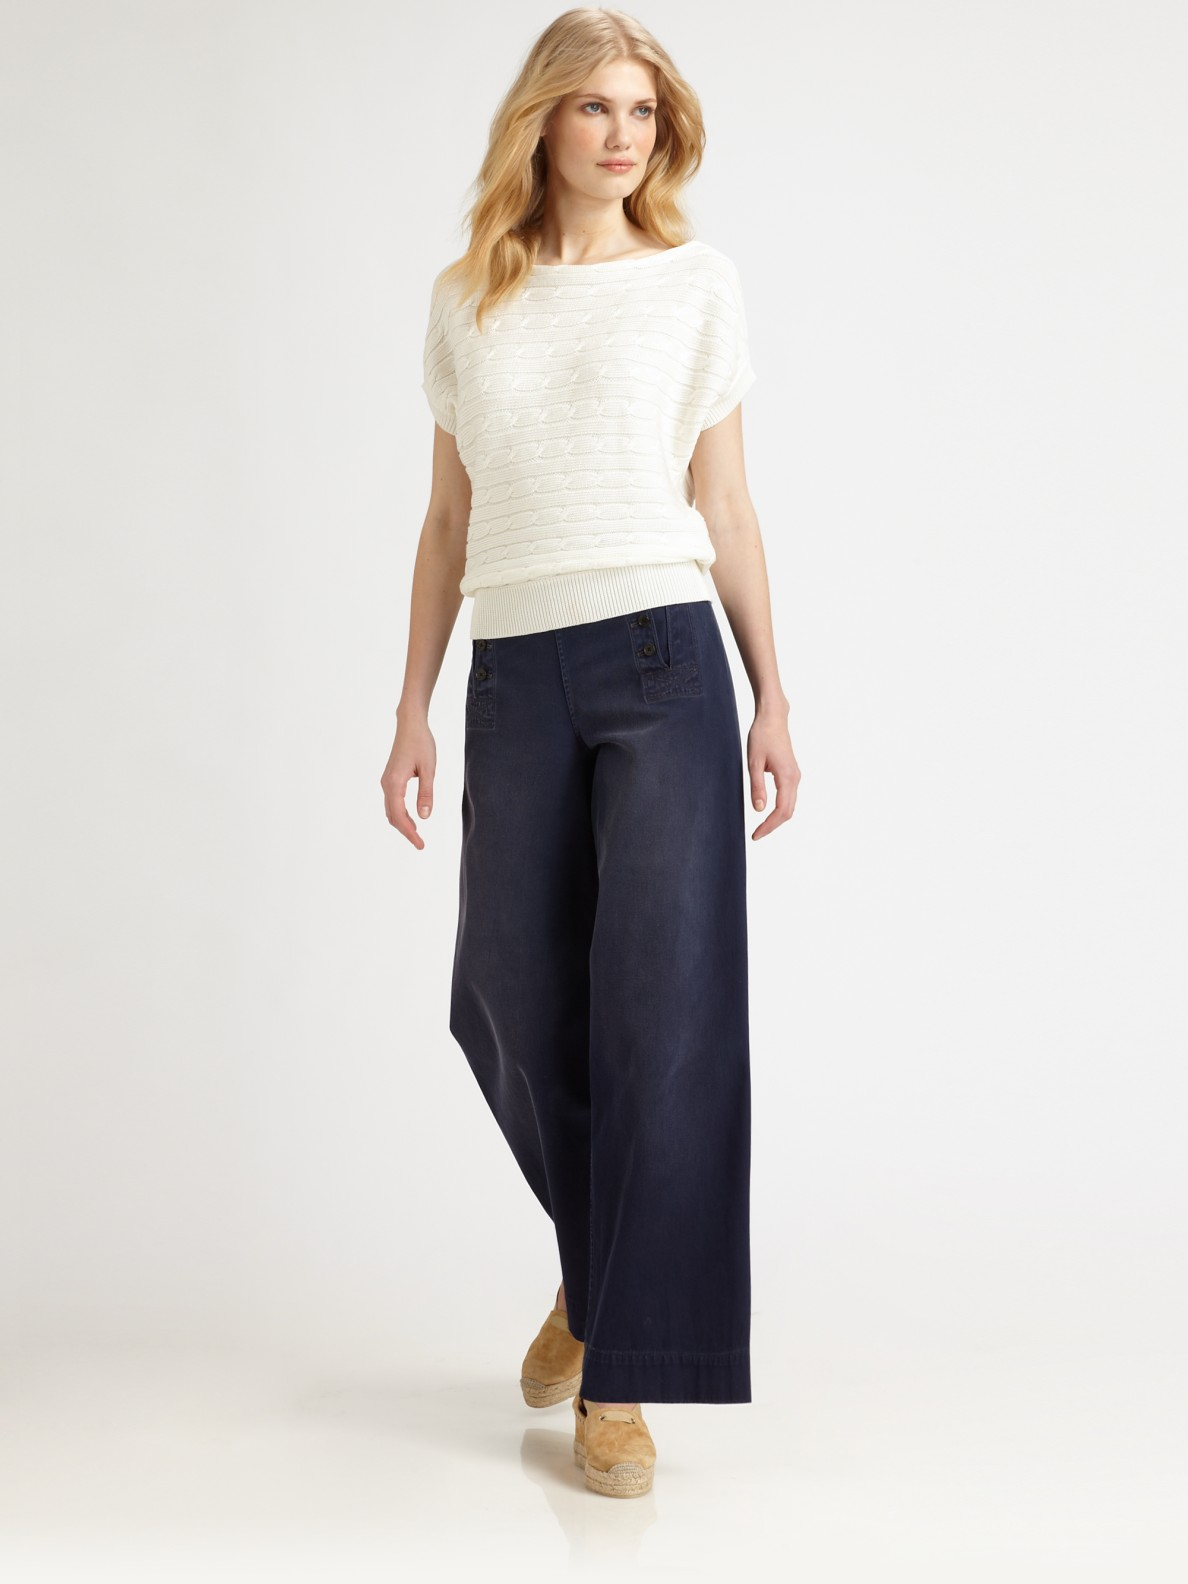 Model Polo Ralph Lauren SlimFit Boyfriend Jeans Jettson Paint Wash  Jeans